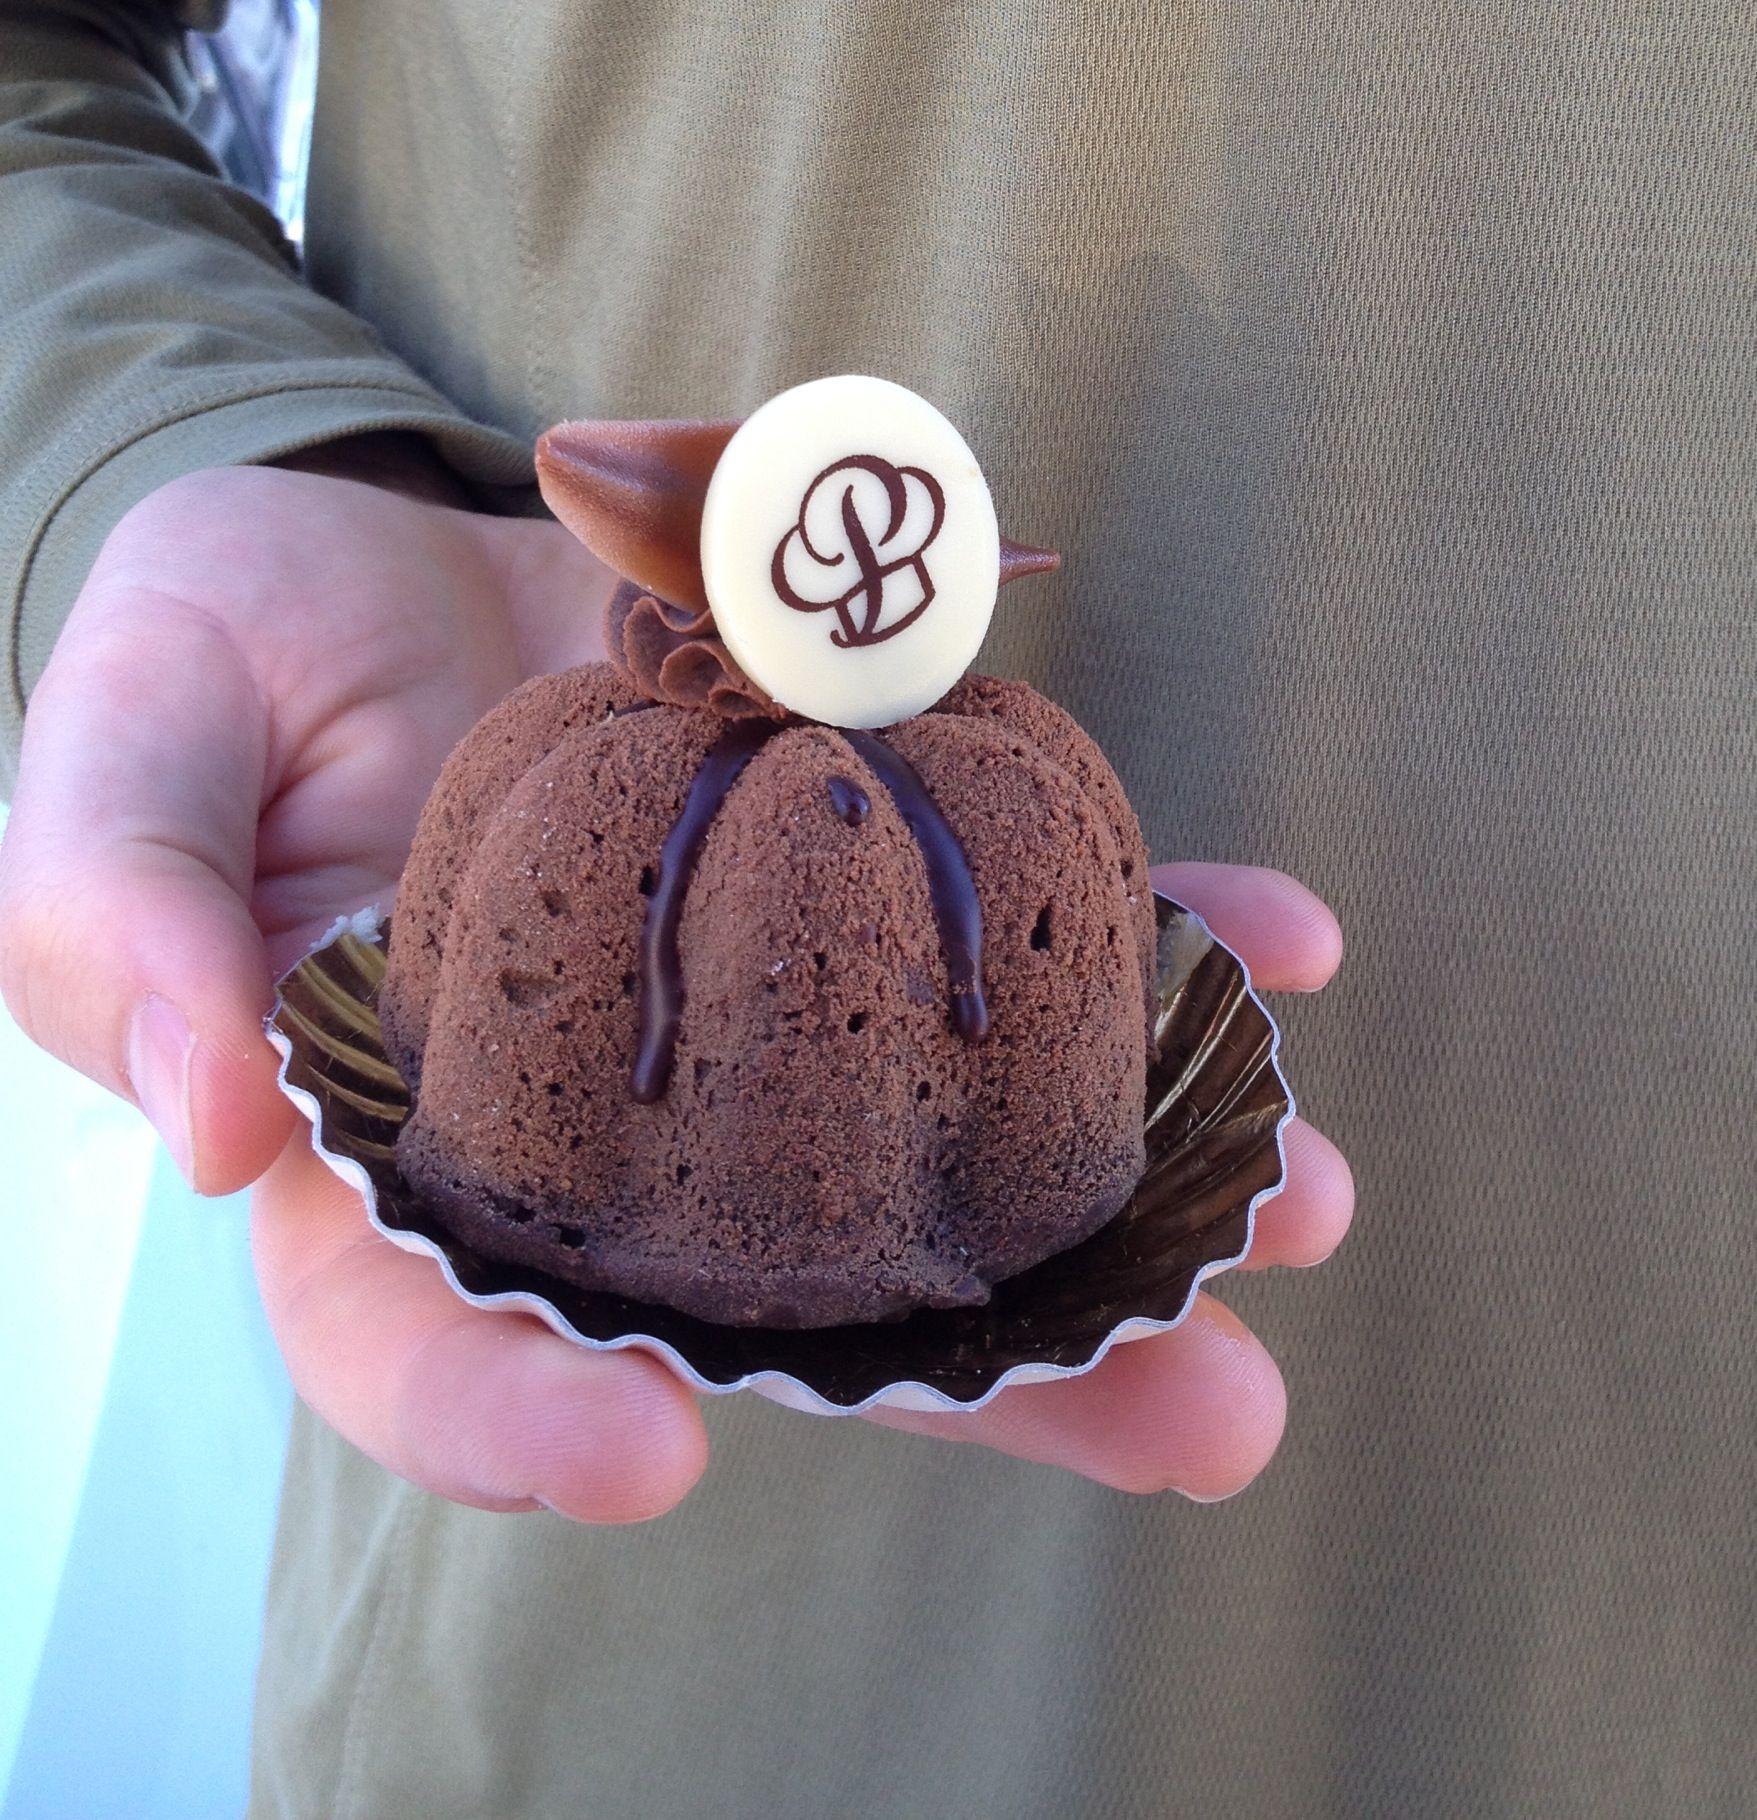 Flourless chocolate cake from portos bakery in burbank